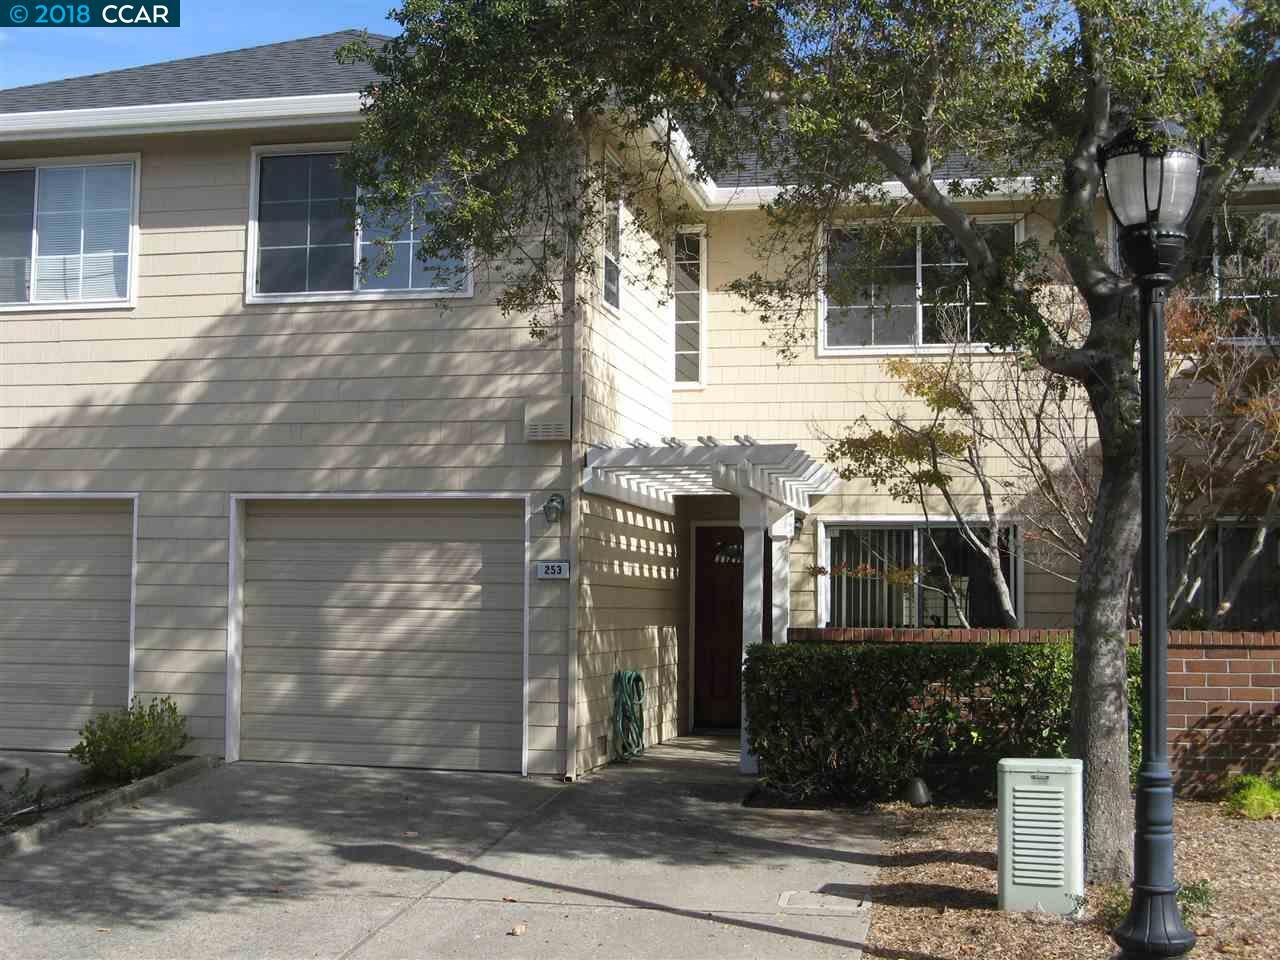 Townhouse for Rent at 253 Hidden creek Court 253 Hidden creek Court Martinez, California 94553 United States